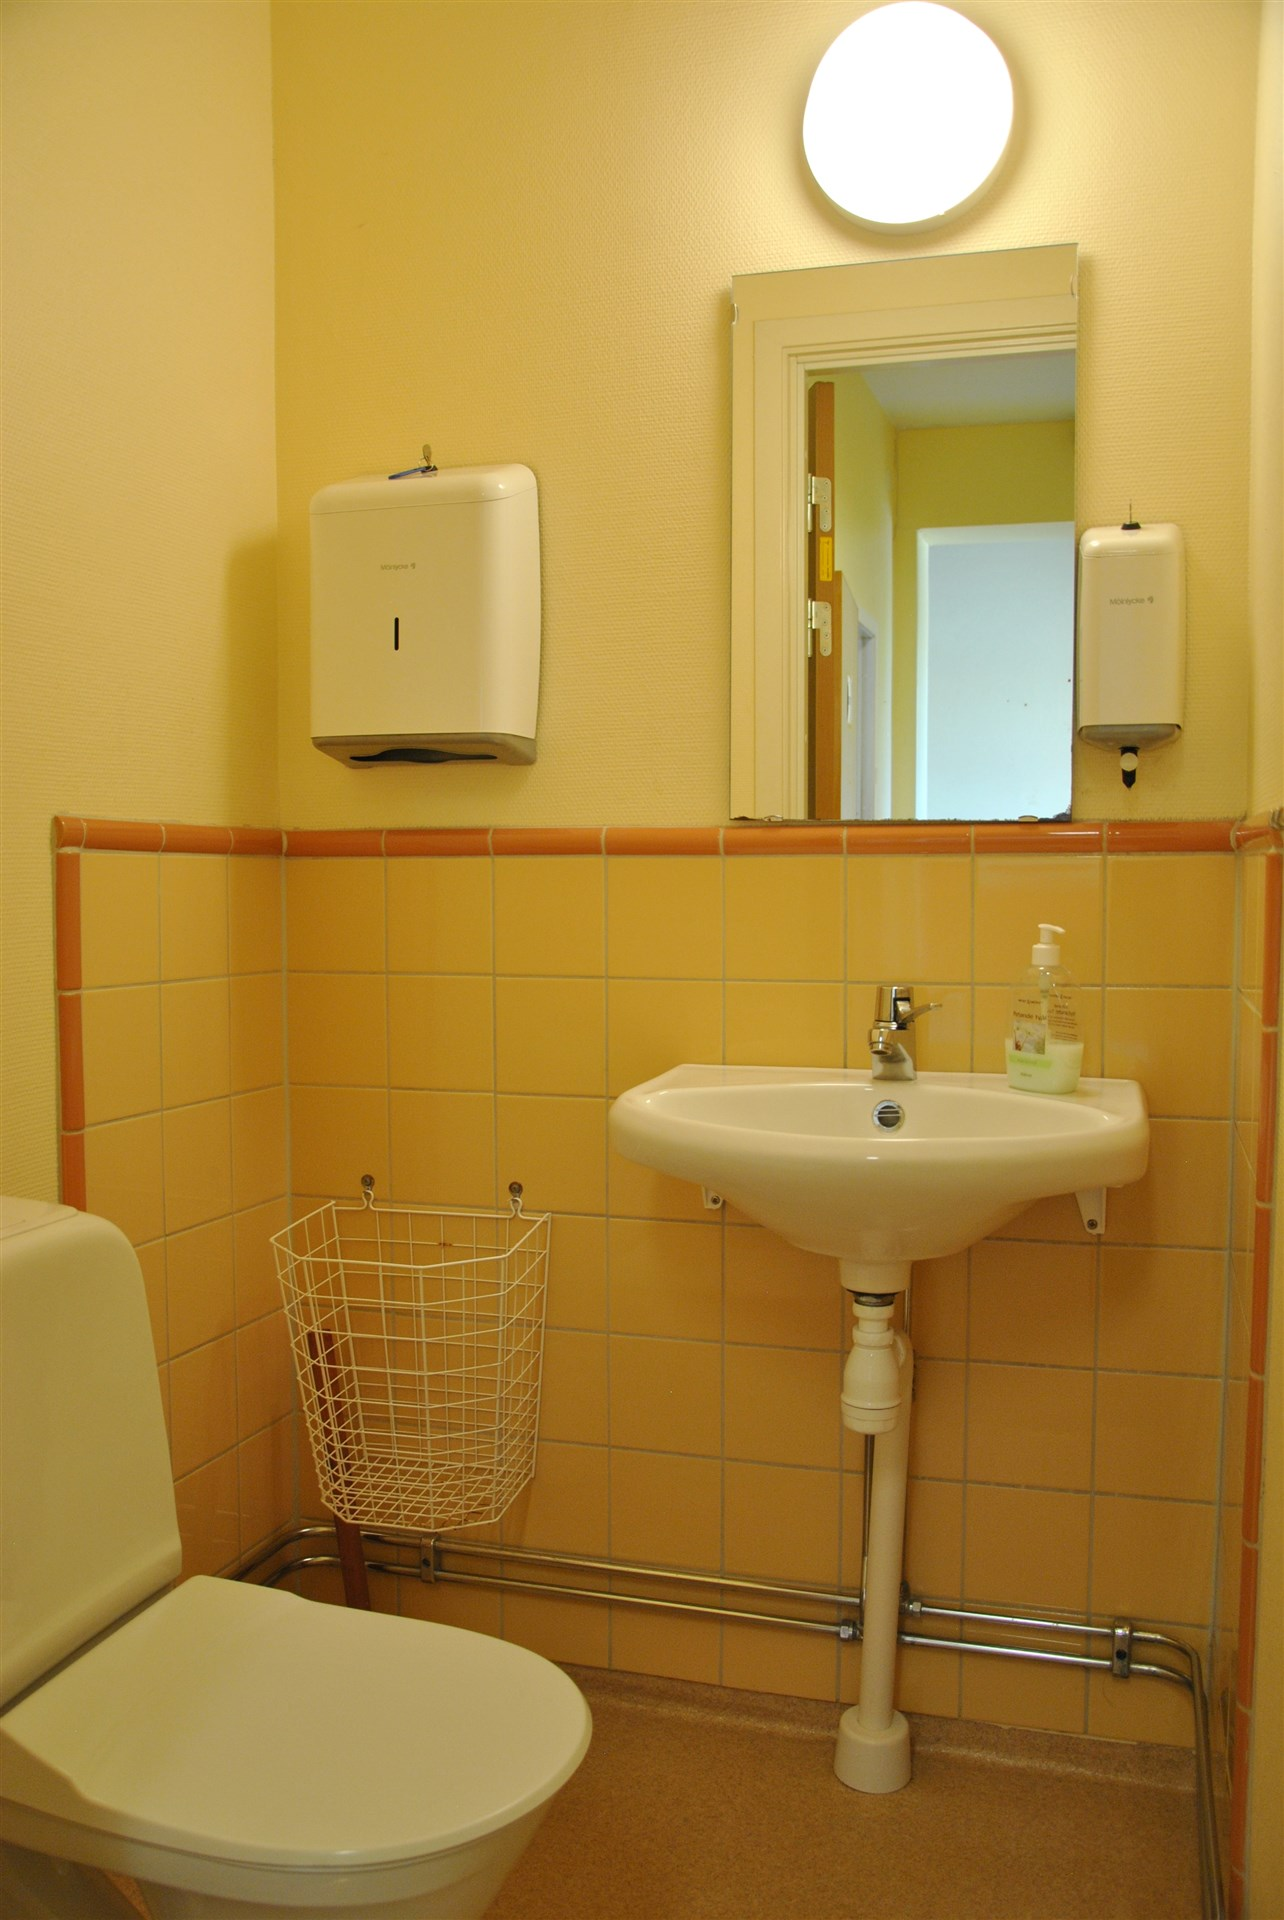 Toalett, vid kontorsdelen